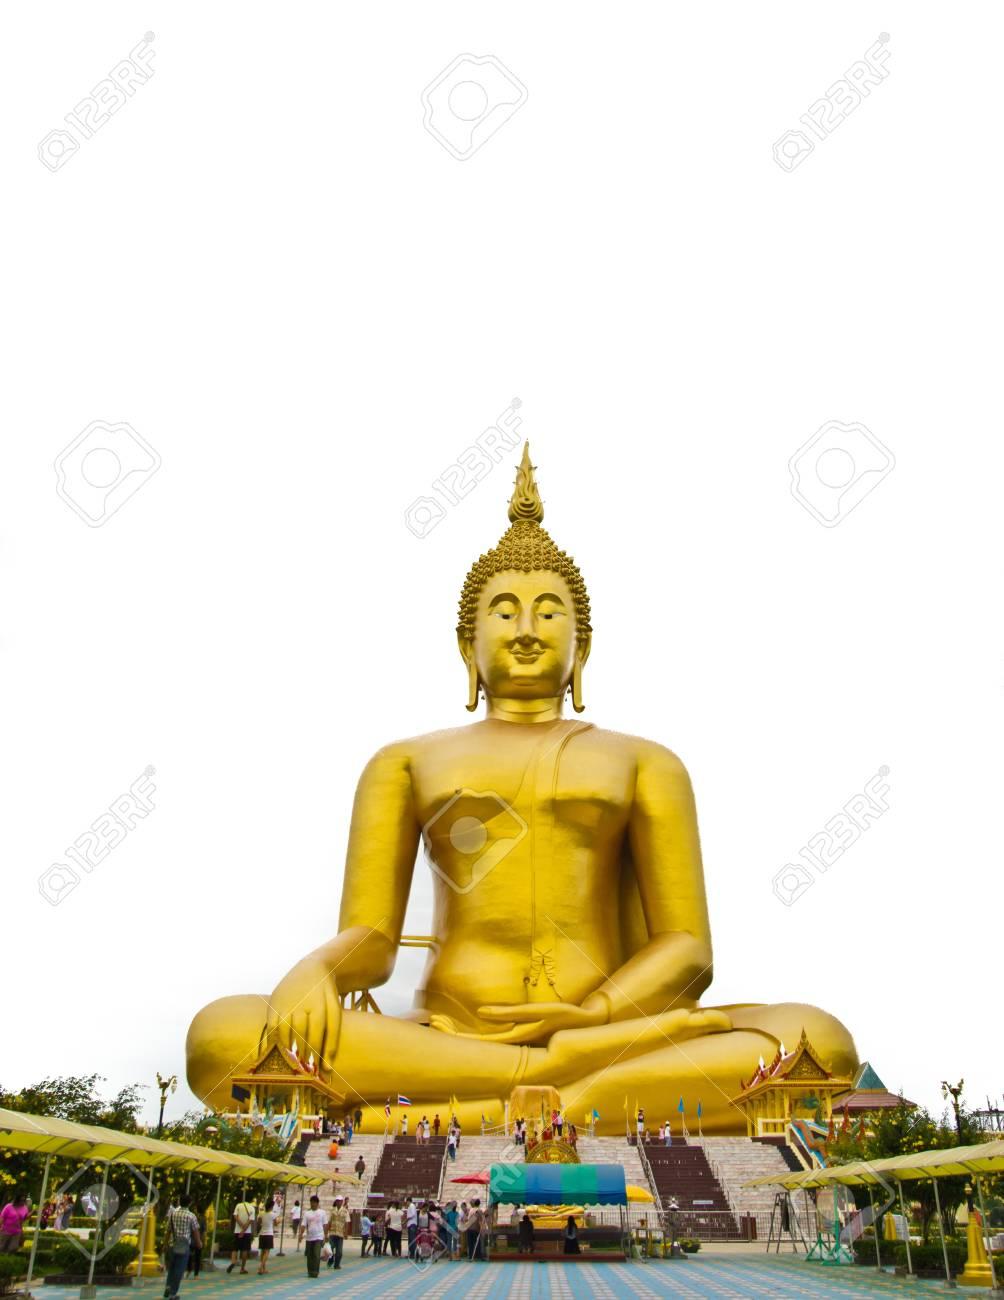 big buddha at thailand Stock Photo - 15355885